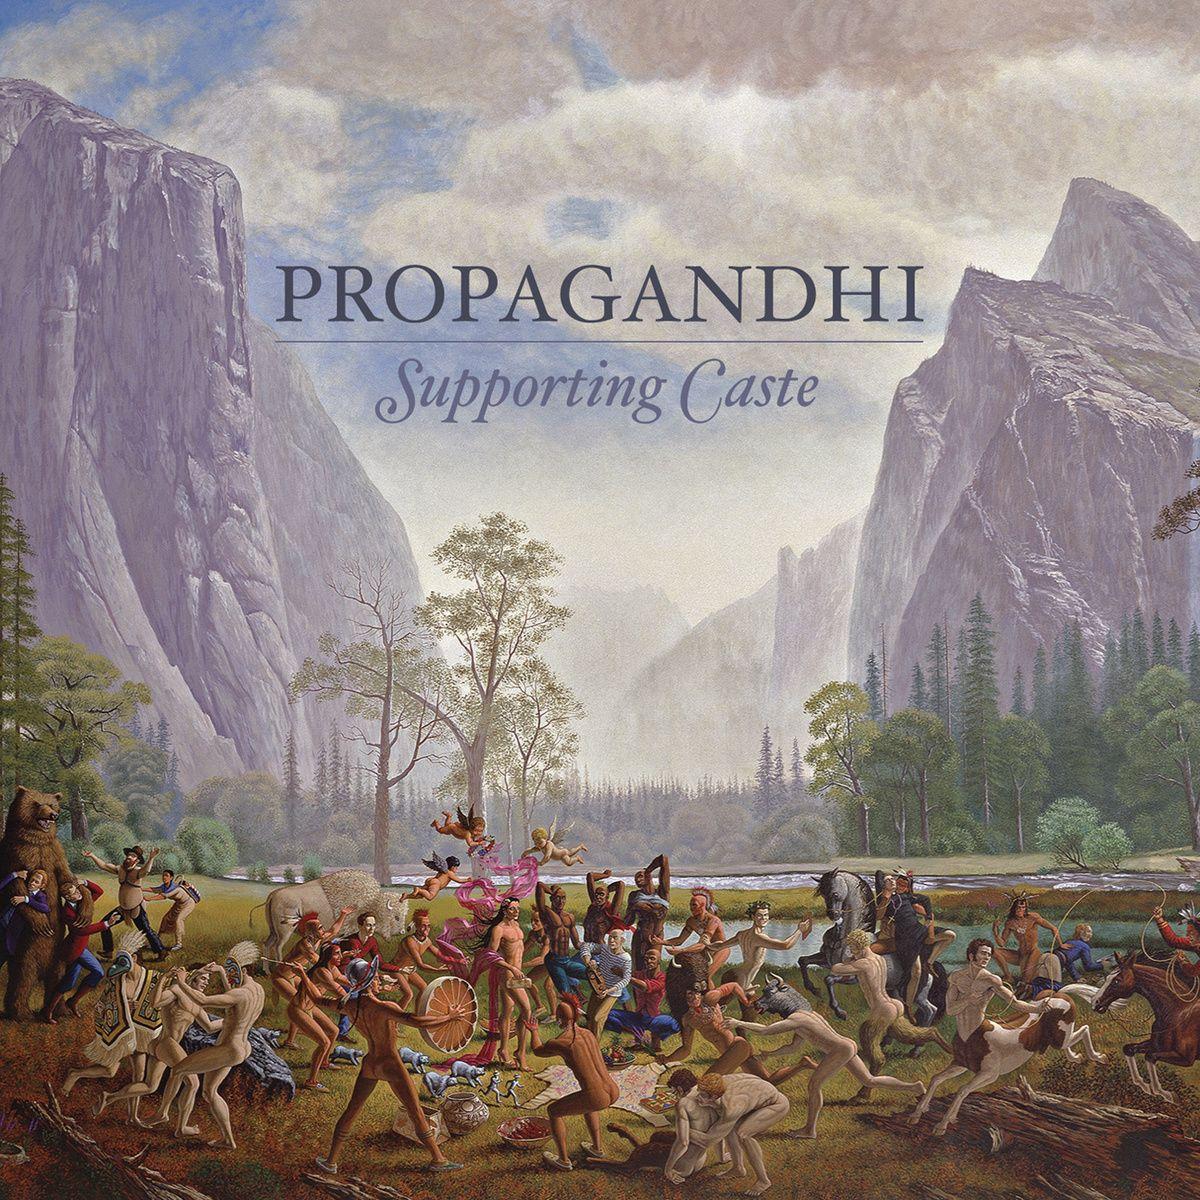 Propagandhi - Supporting Caste (2009)